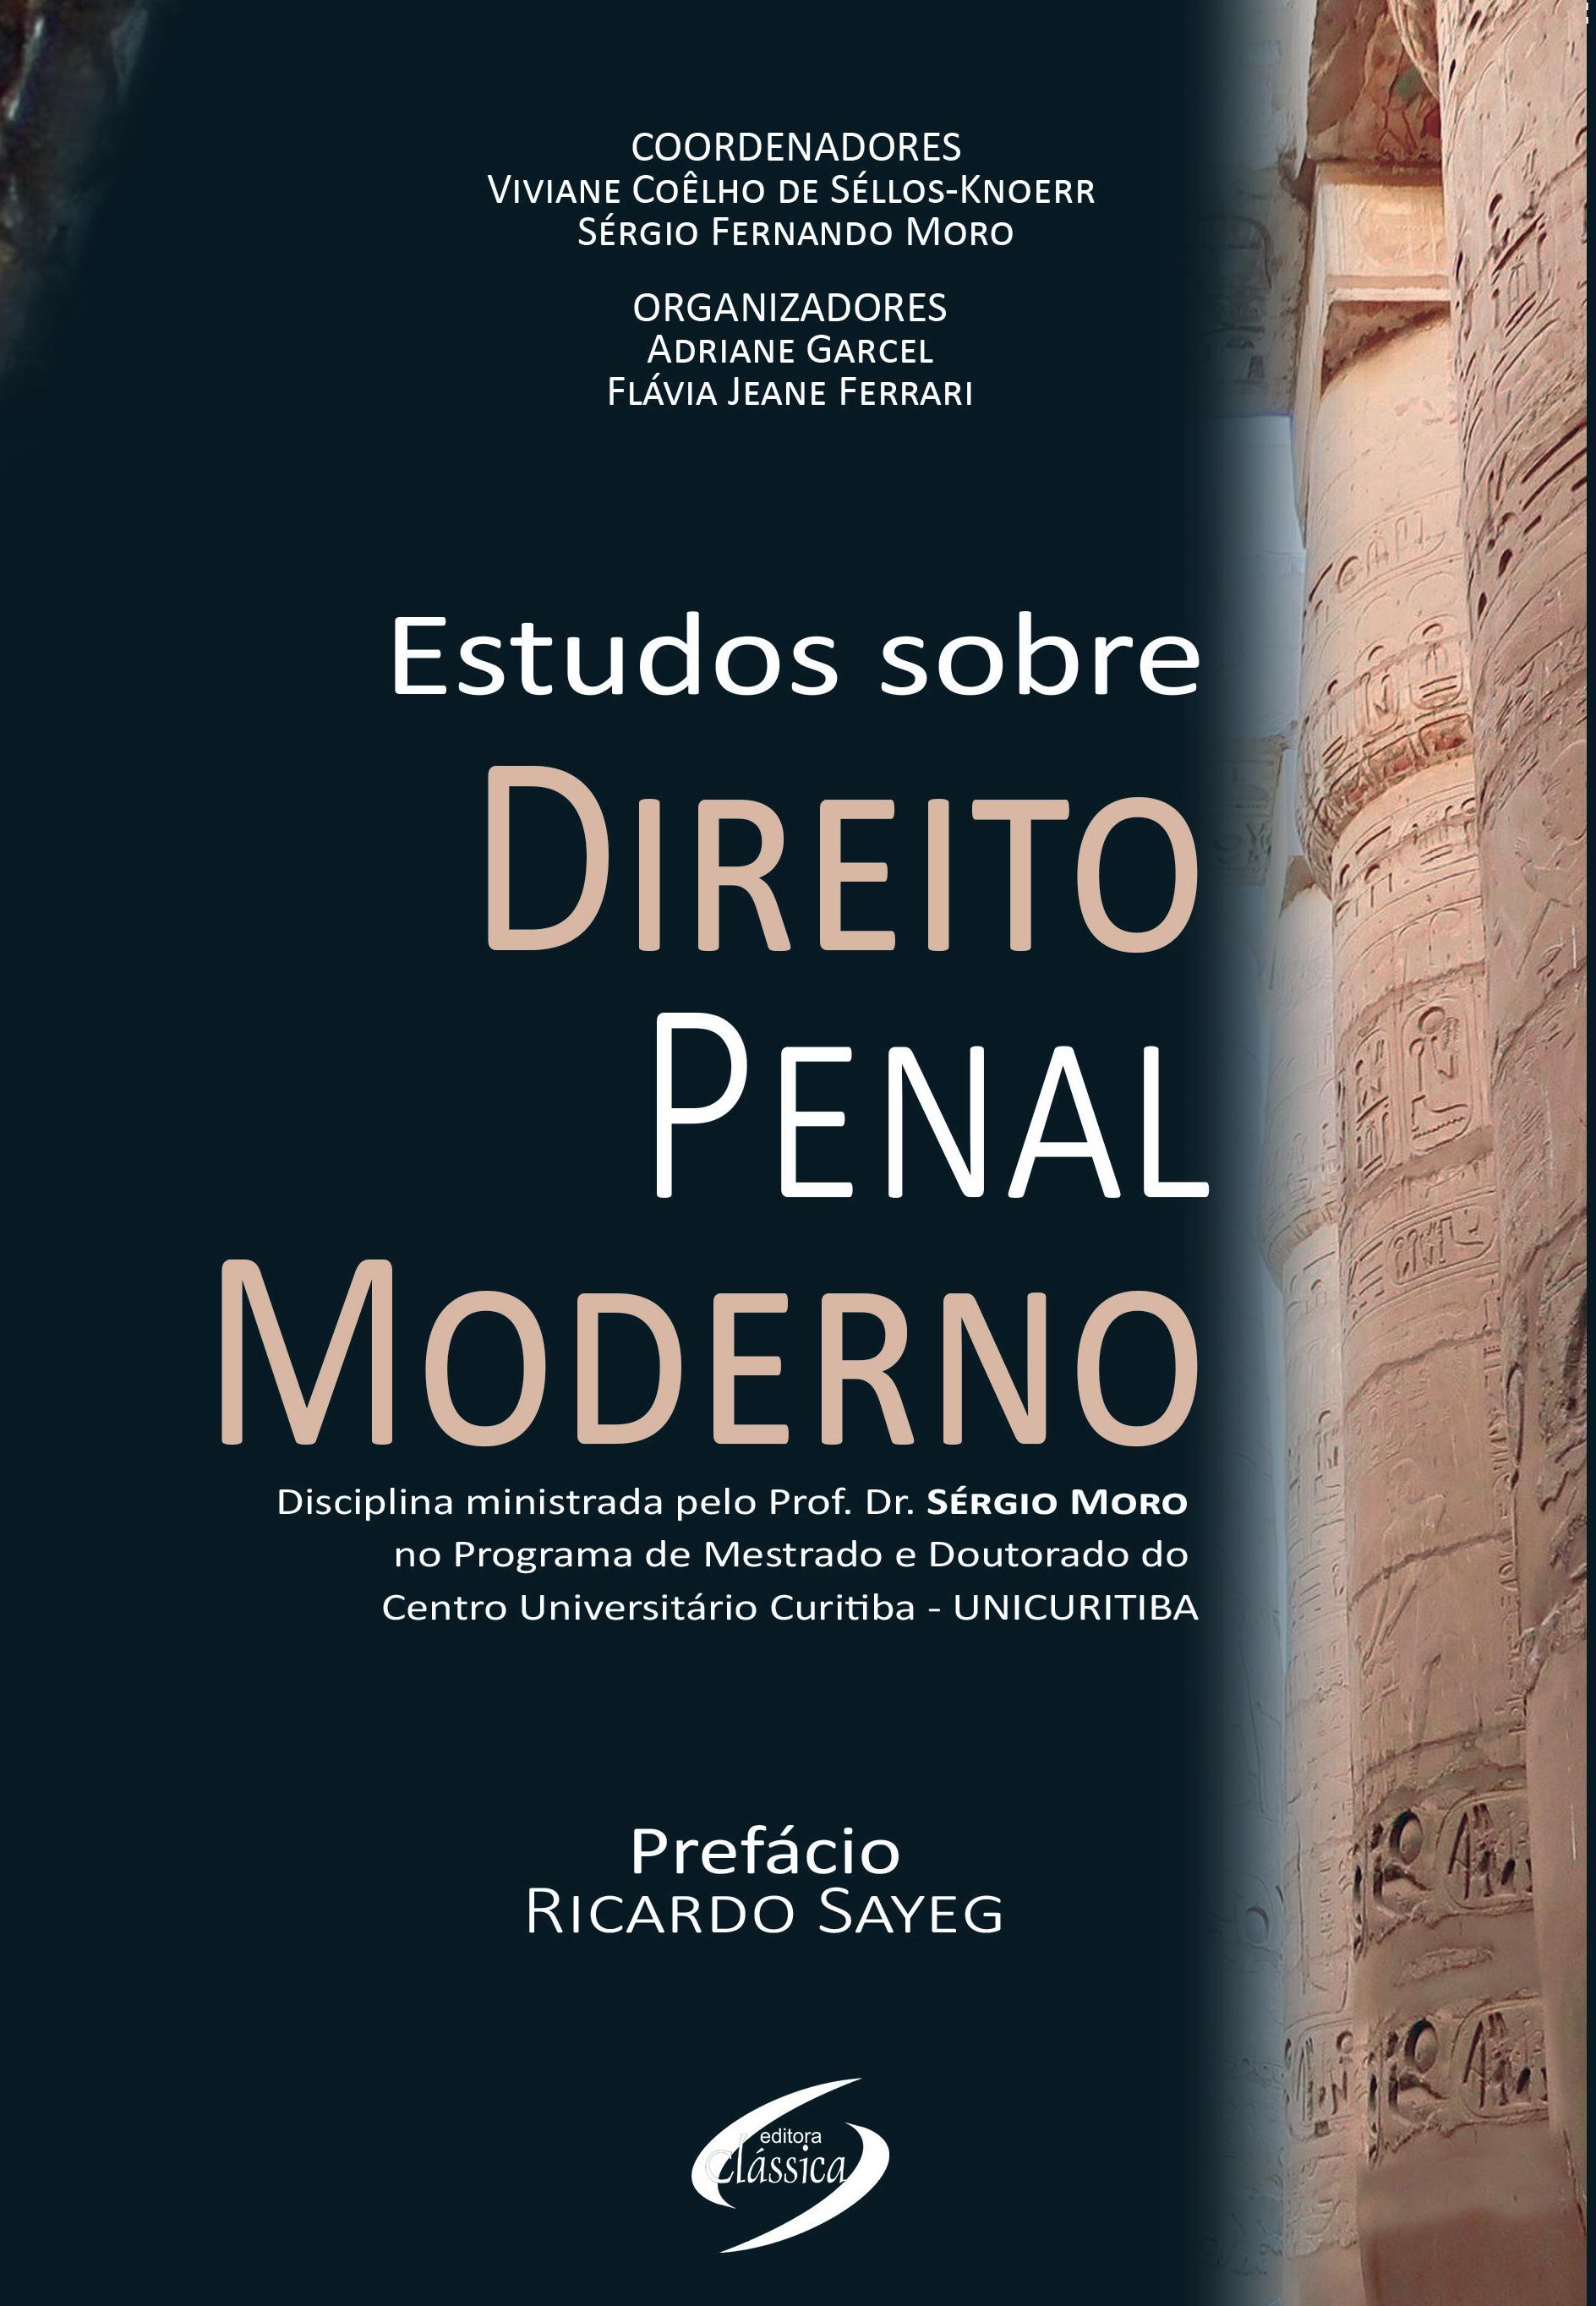 Estudos sobre Direito Penal Moderno